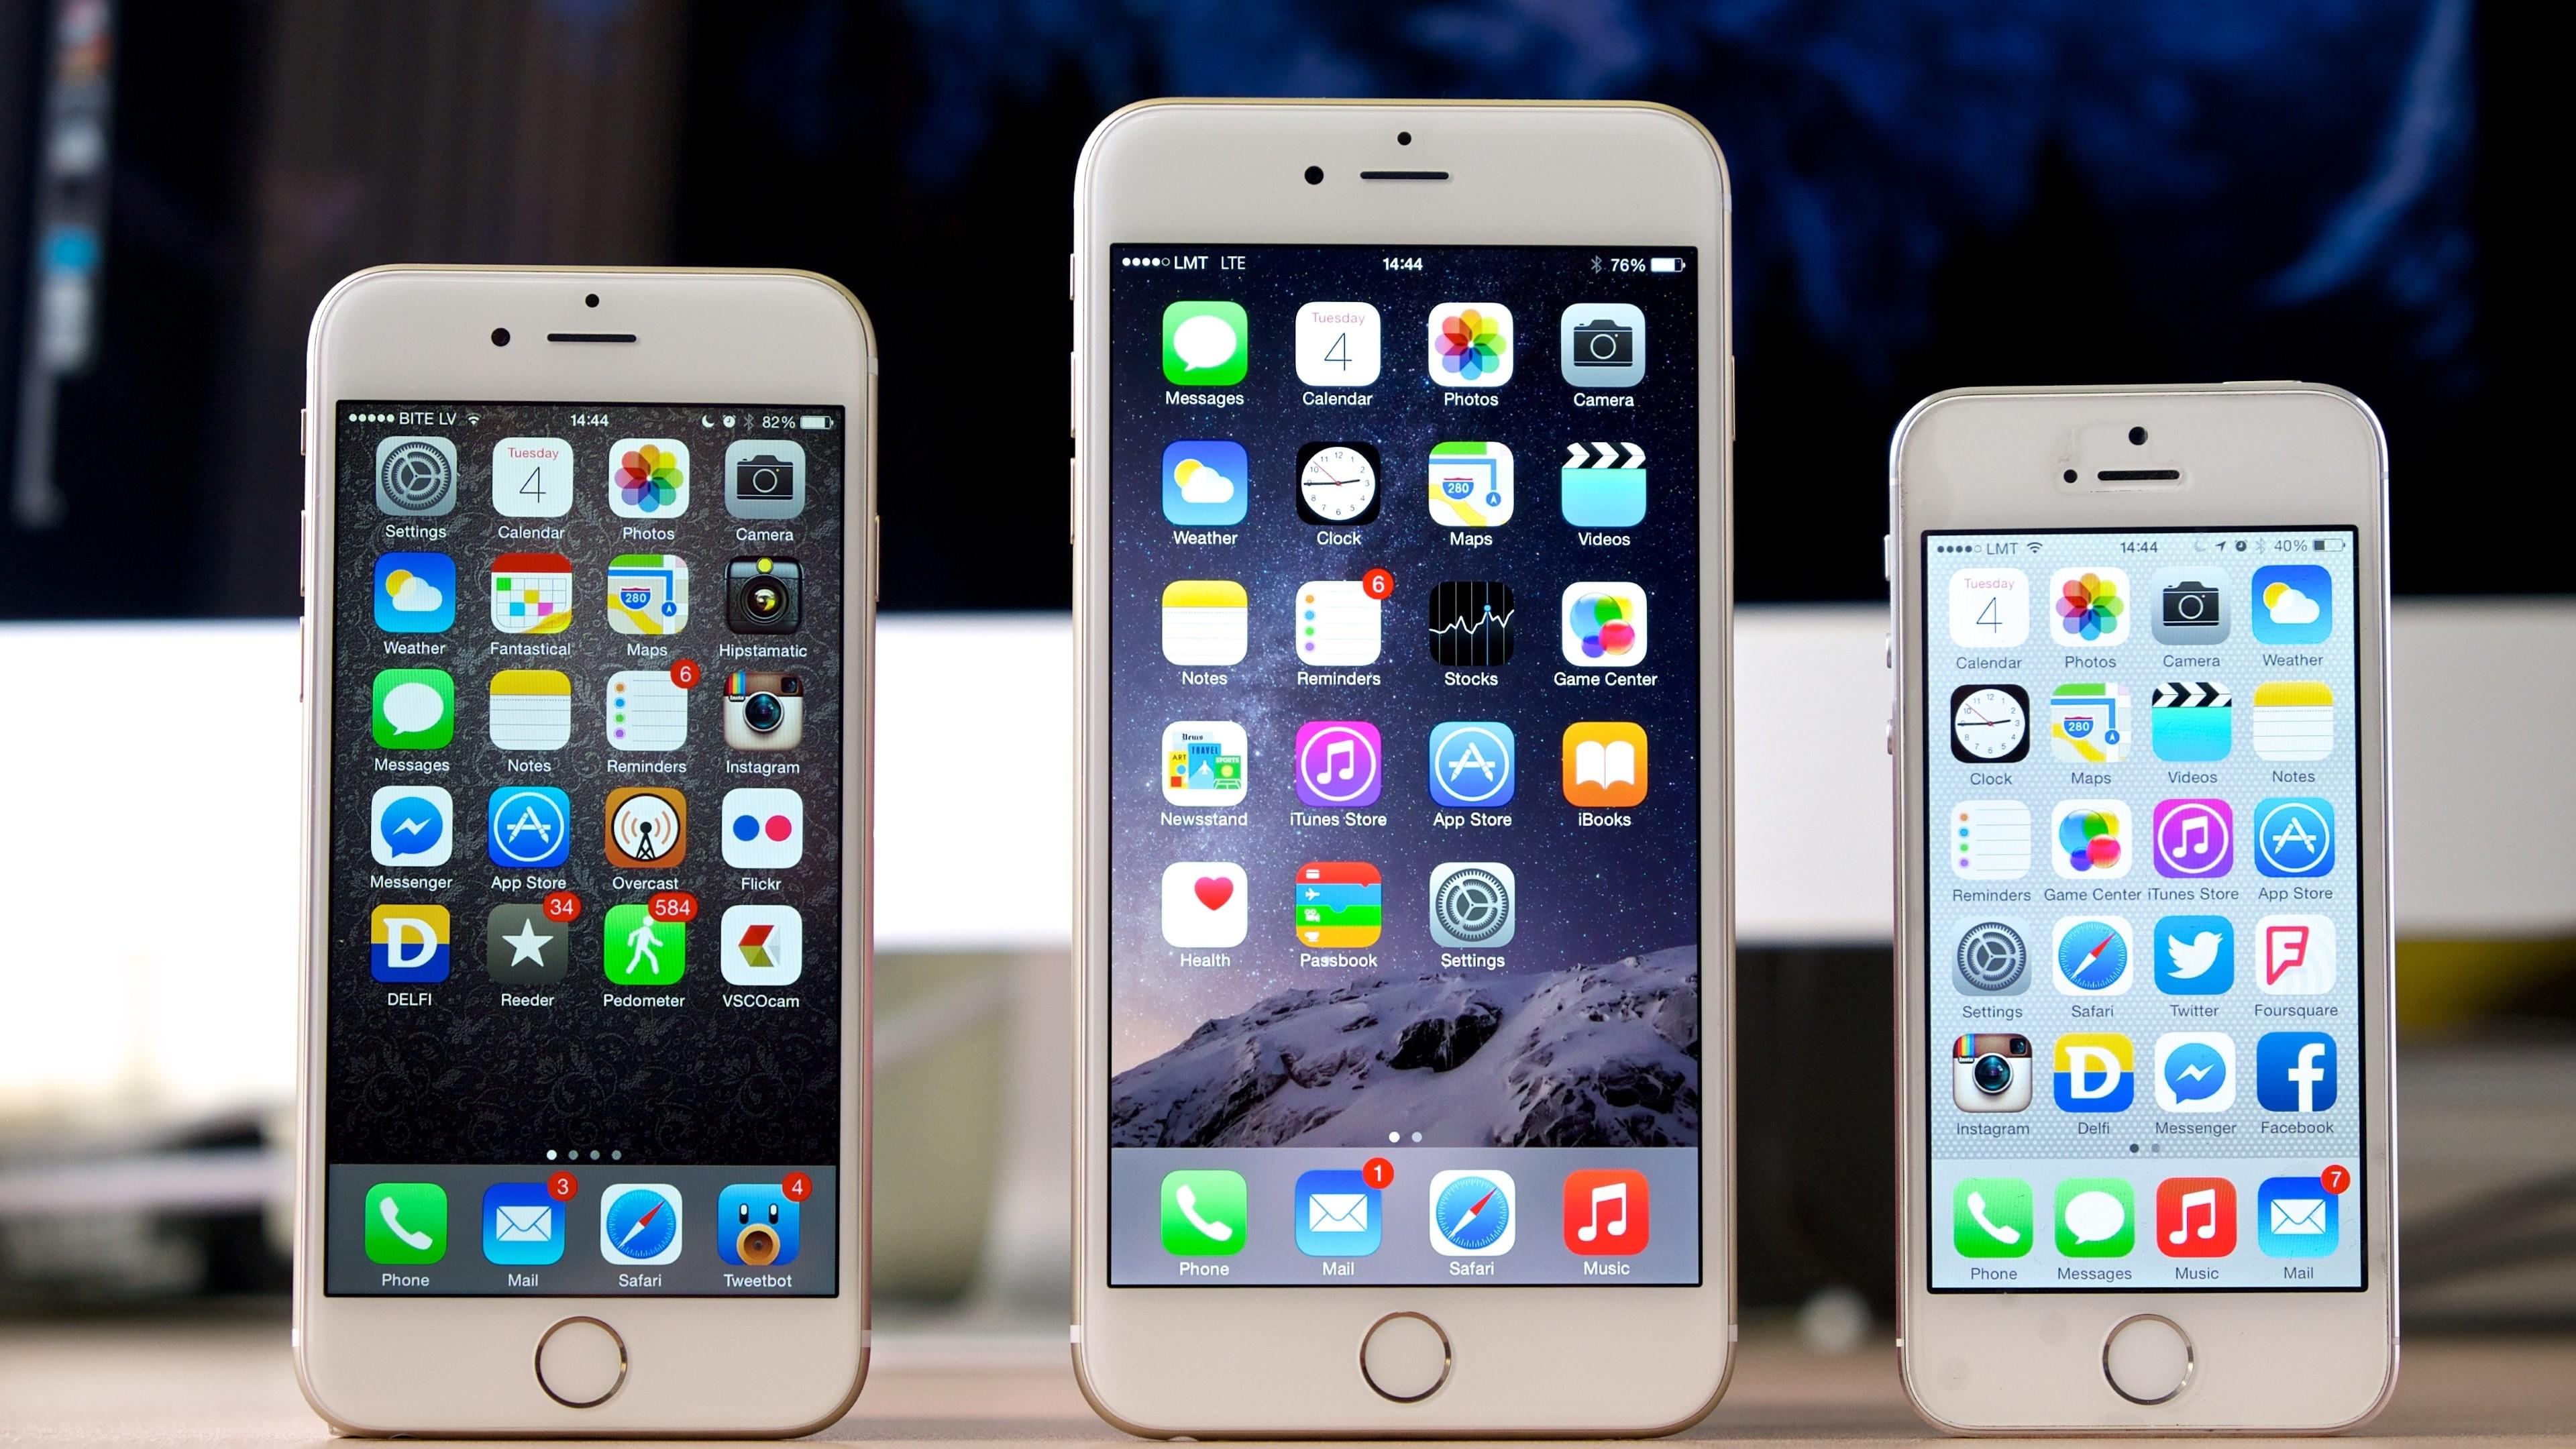 Wallpaper: iPhone 6 vs iPhone 6 Plus vs iPhone 5S